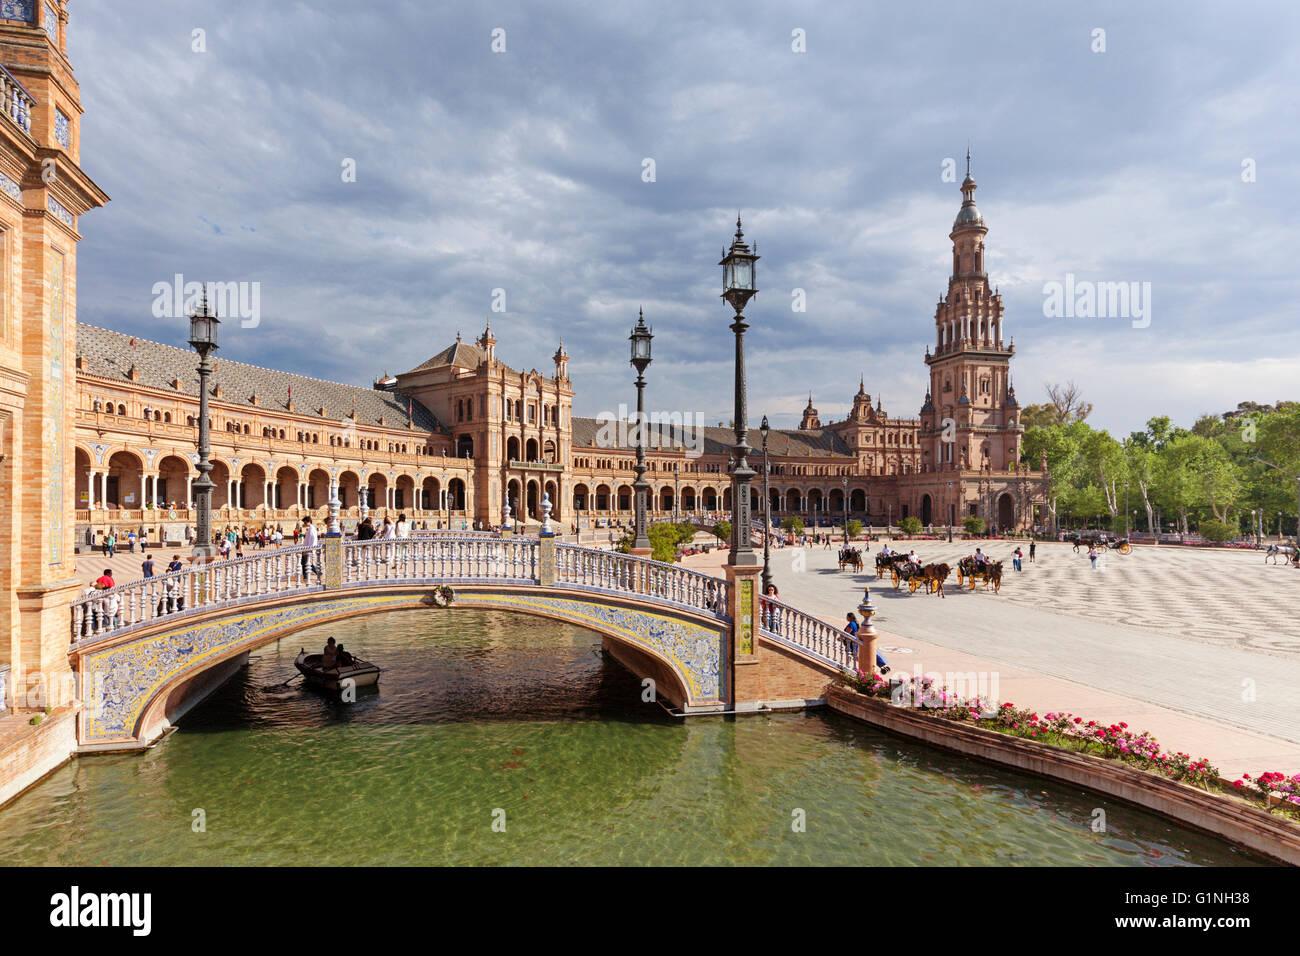 Tourists at UNESCO world heritage site Plaza de Espana, Seville, Spain. - Stock Image